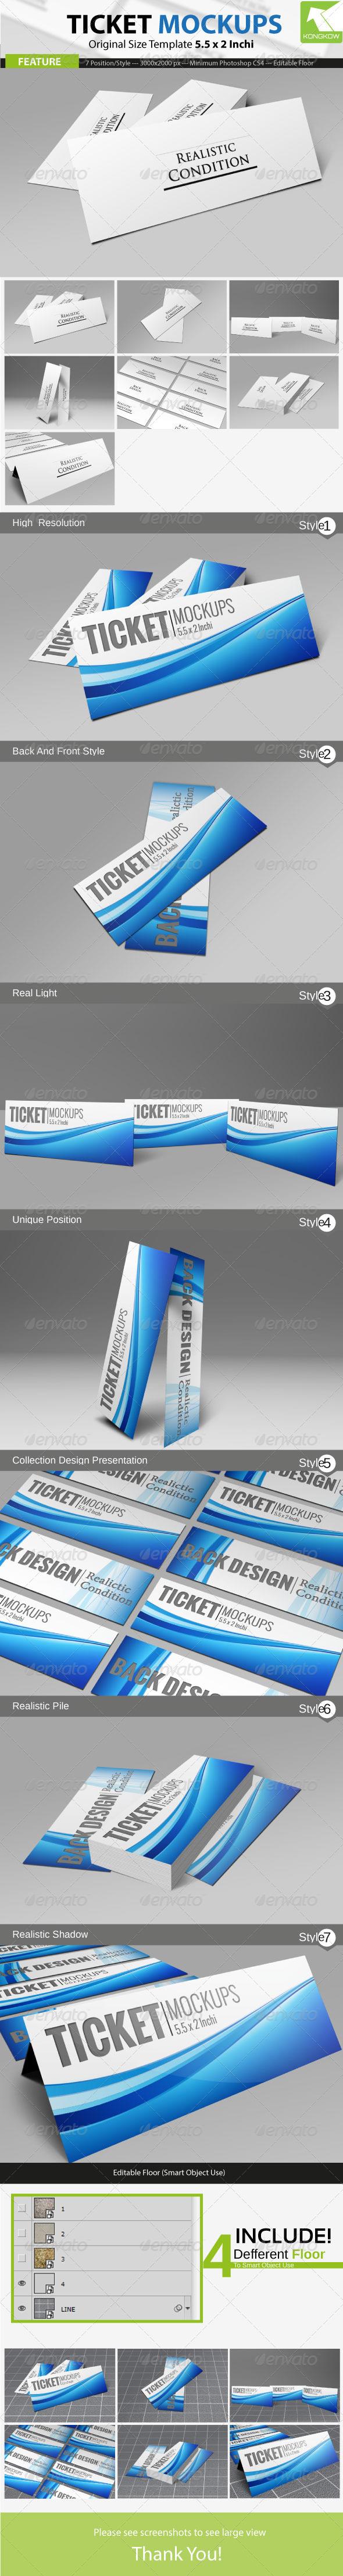 Ticket Mockups  - Print Product Mock-Ups